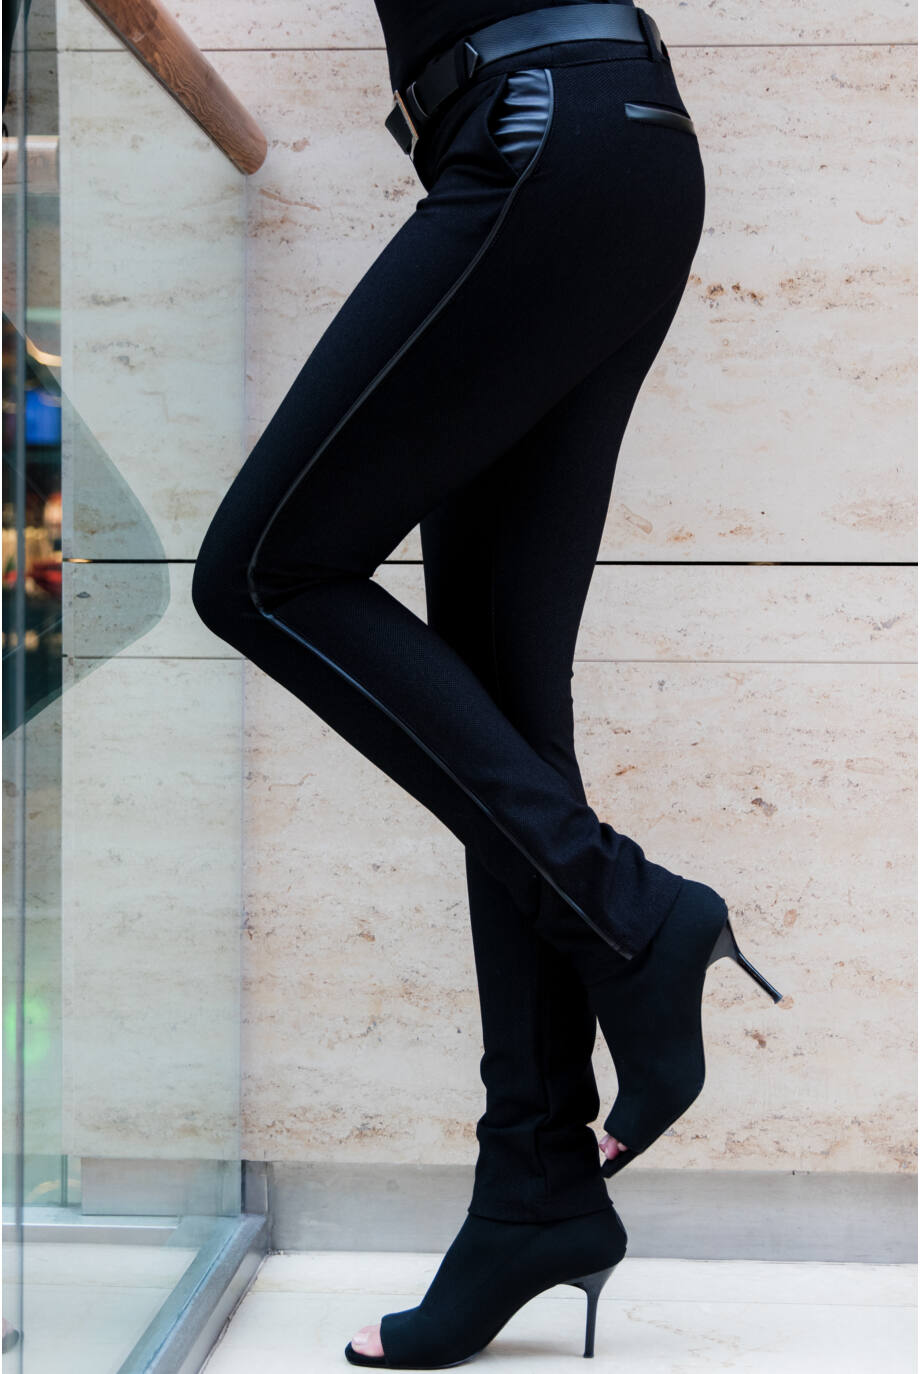 Tűpöttyös bőrpaszpolos nadrág - ROXANA